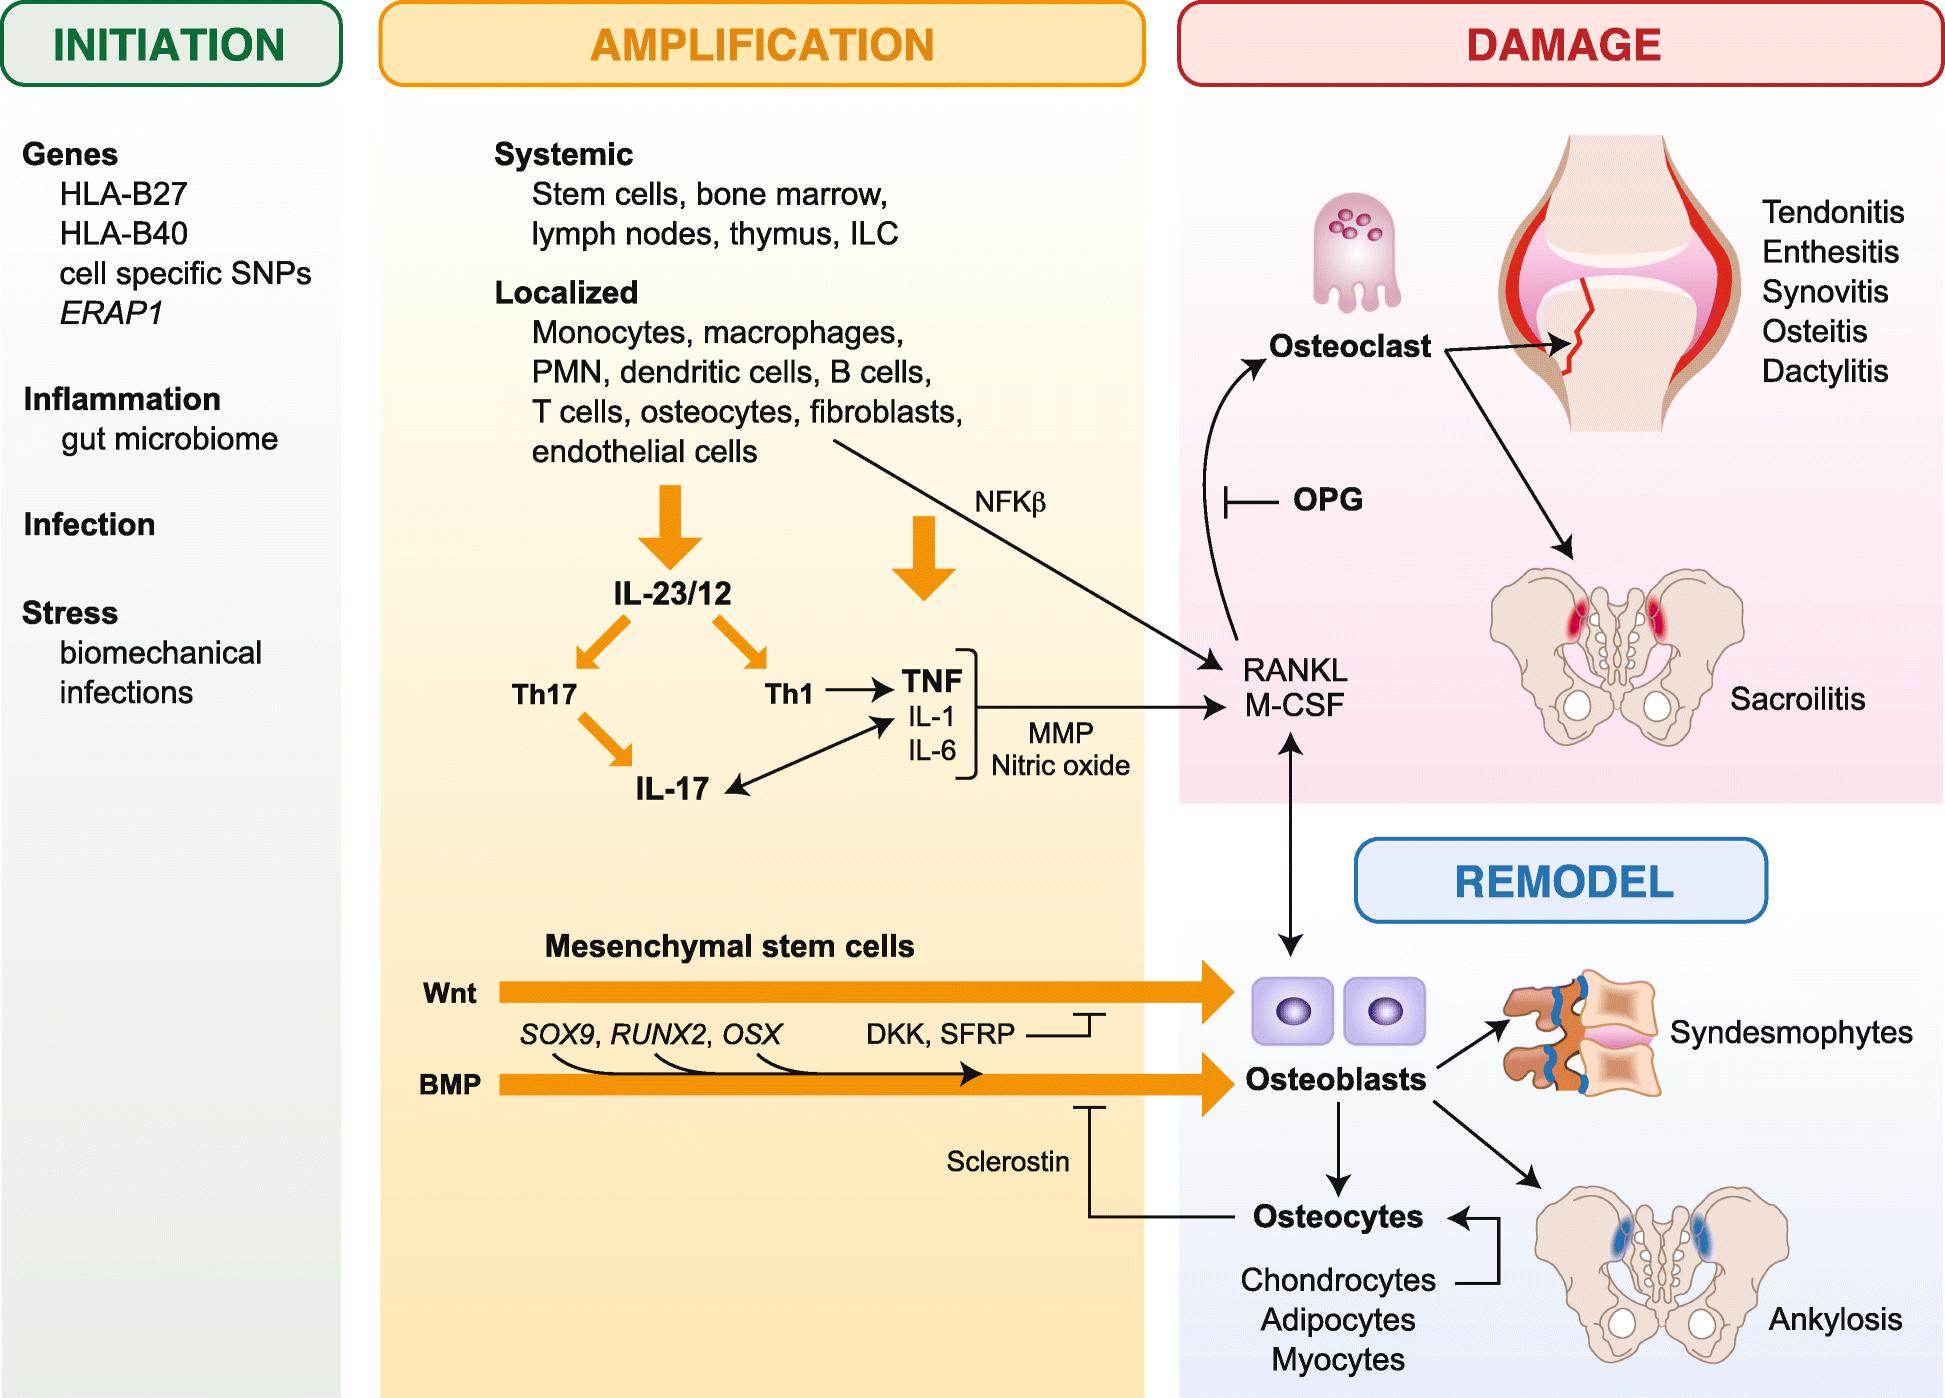 Targeting inflammatory pathways in axial spondyloarthritis